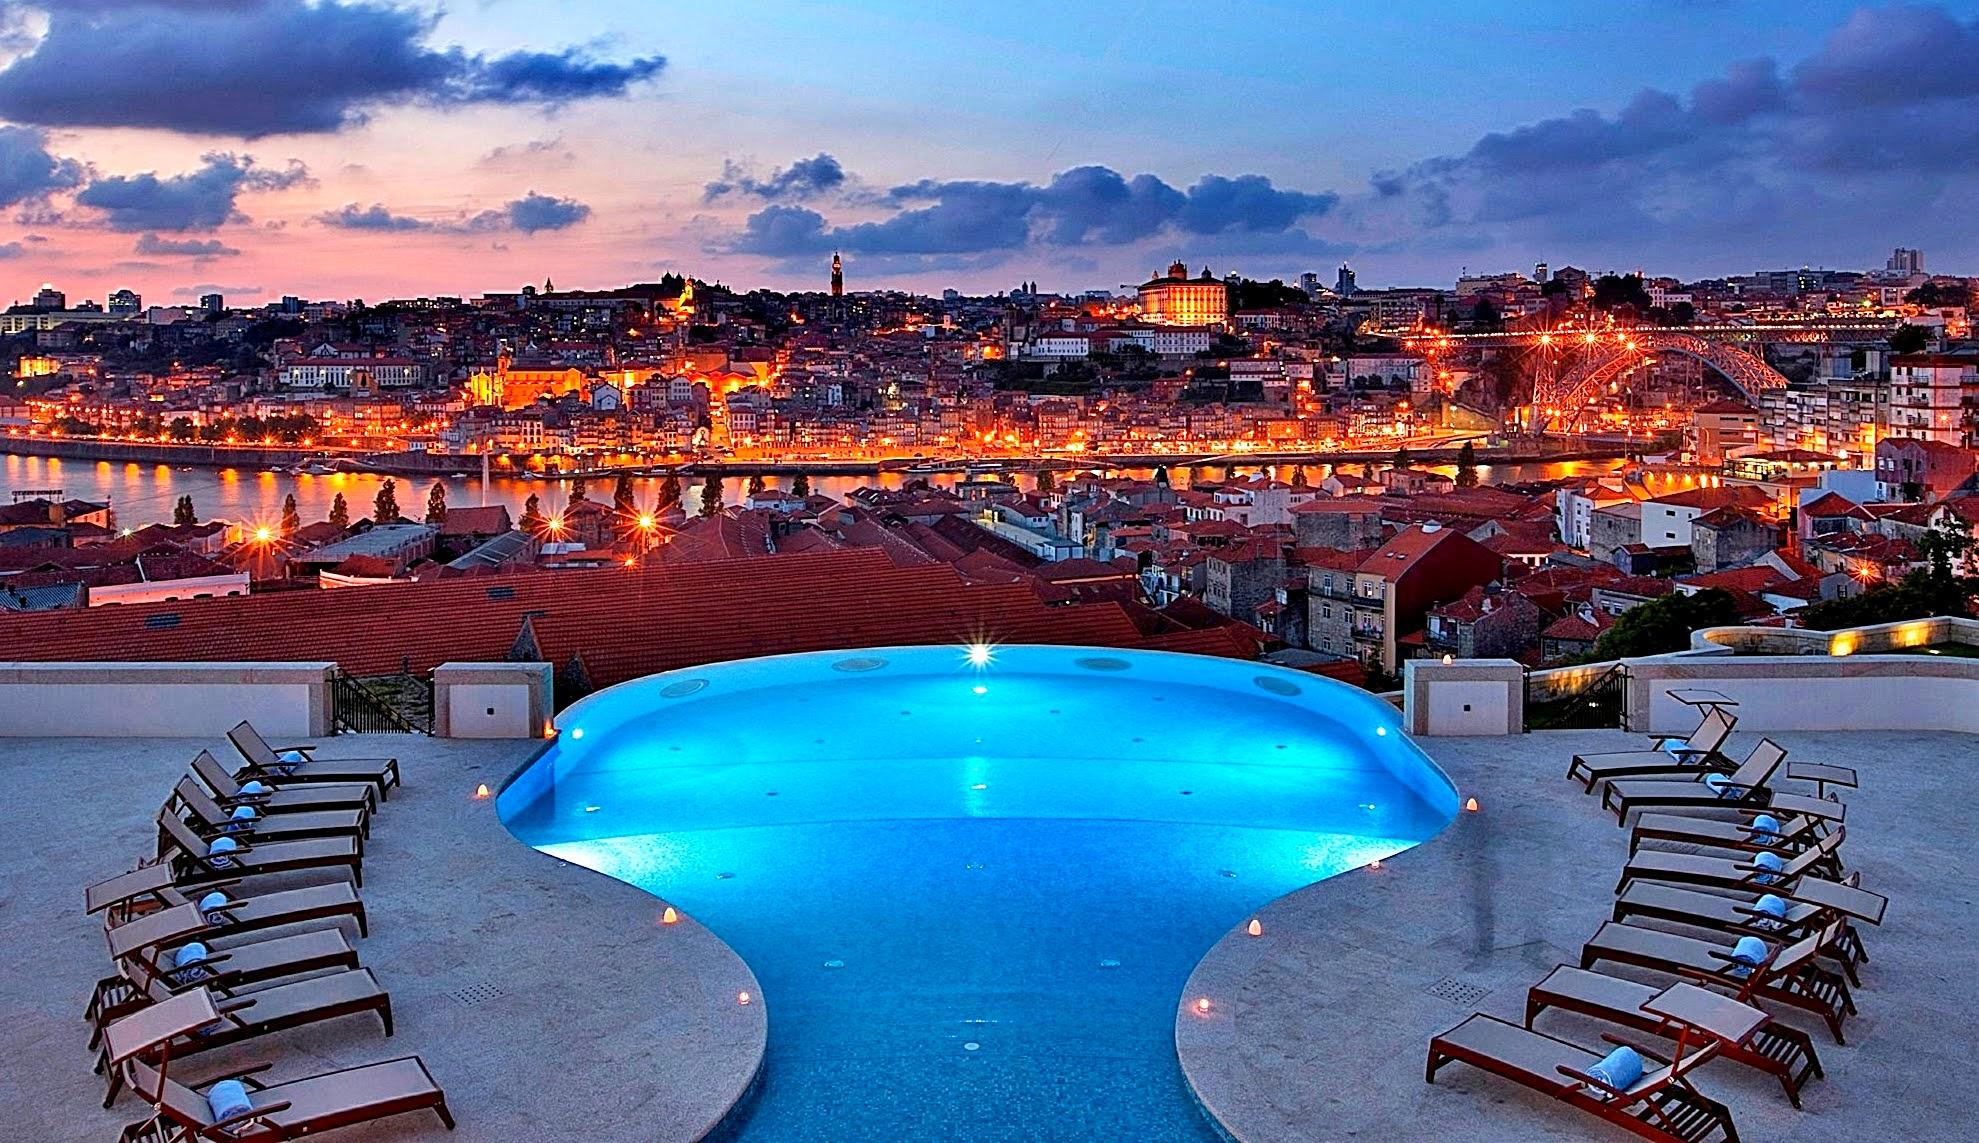 Fotos de piscinas bonitas finest conhea as piscinas for Imagenes de piscinas bonitas